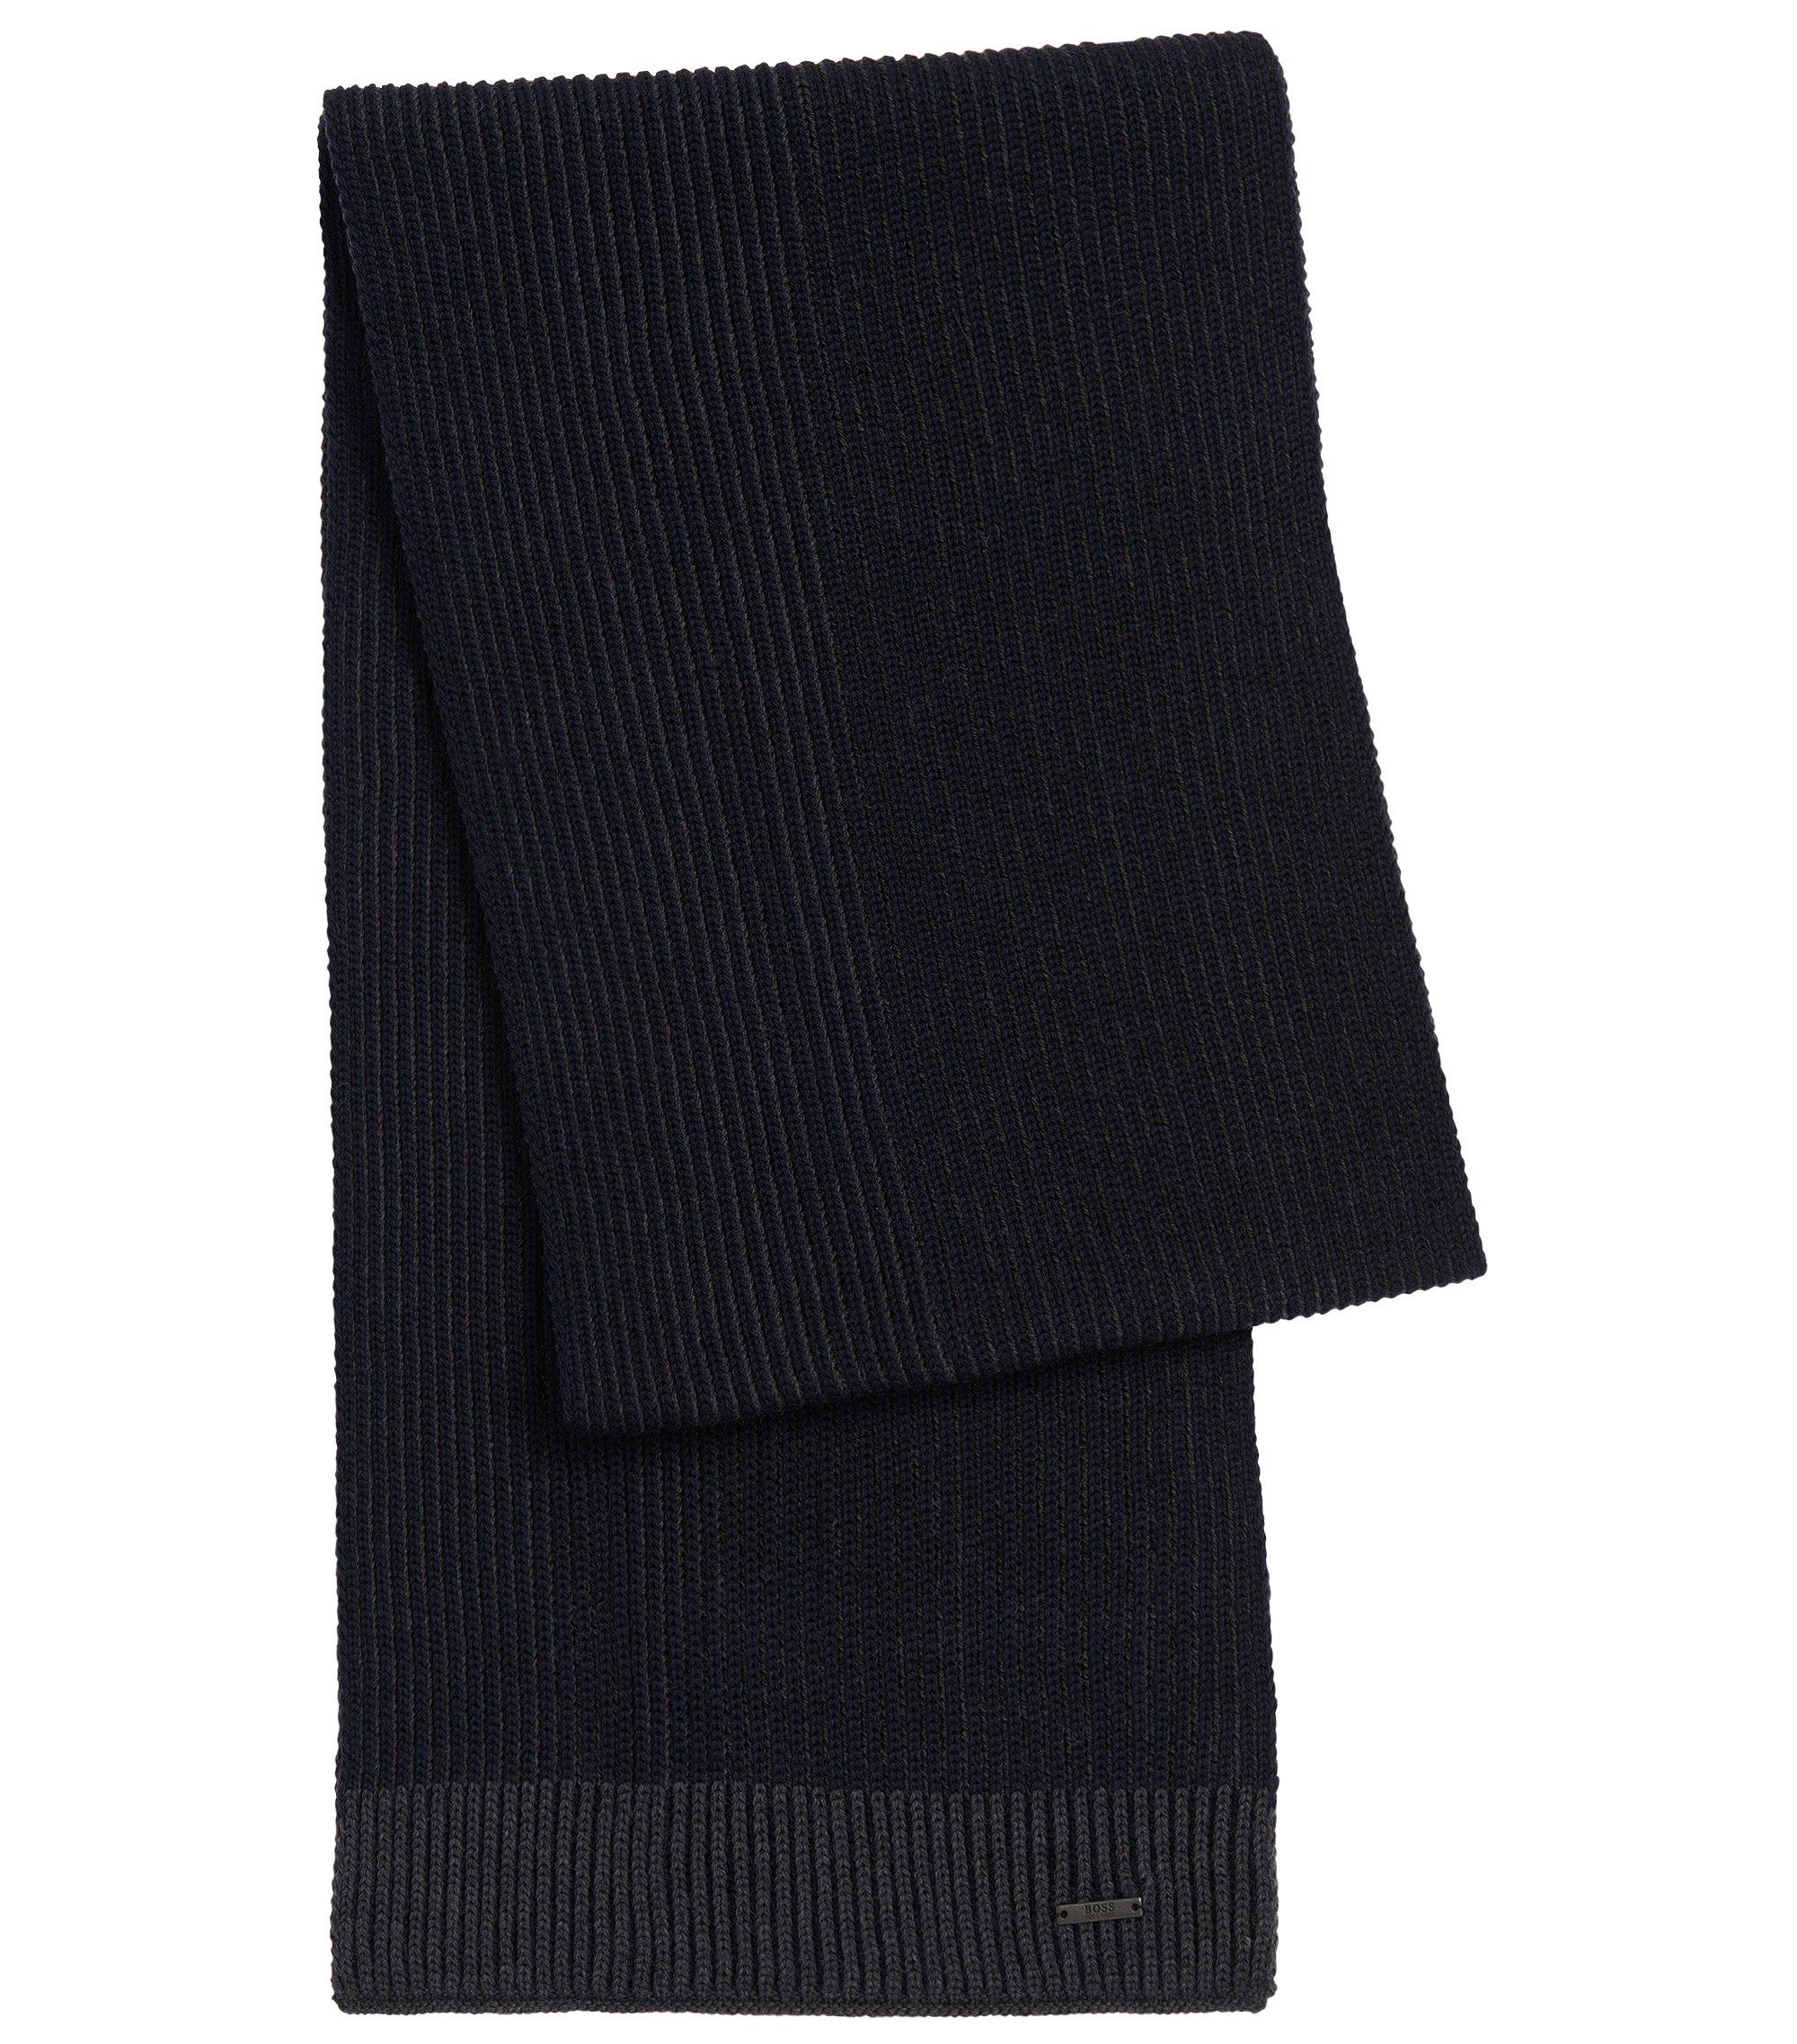 Virgin Wool Contrast Knit Scarf | Balios, Dark Blue